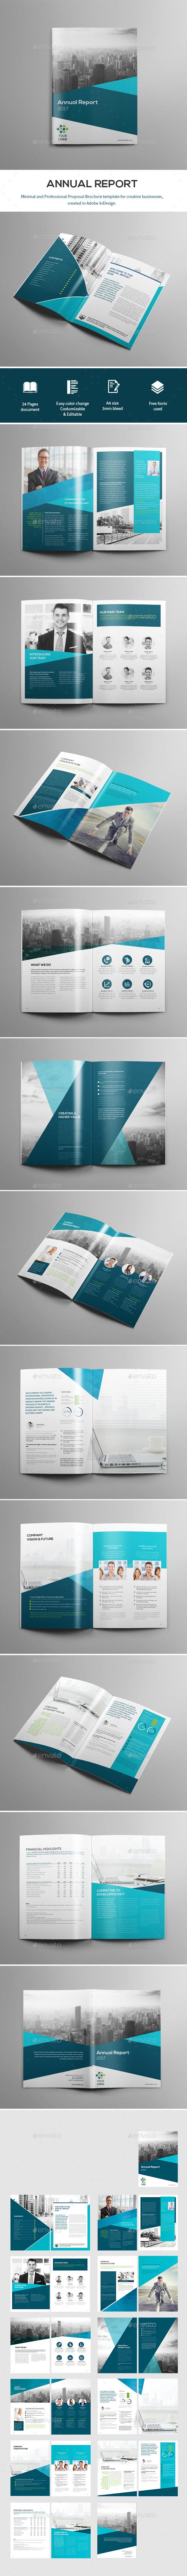 Creative Brochure Template - Corporate Brochures